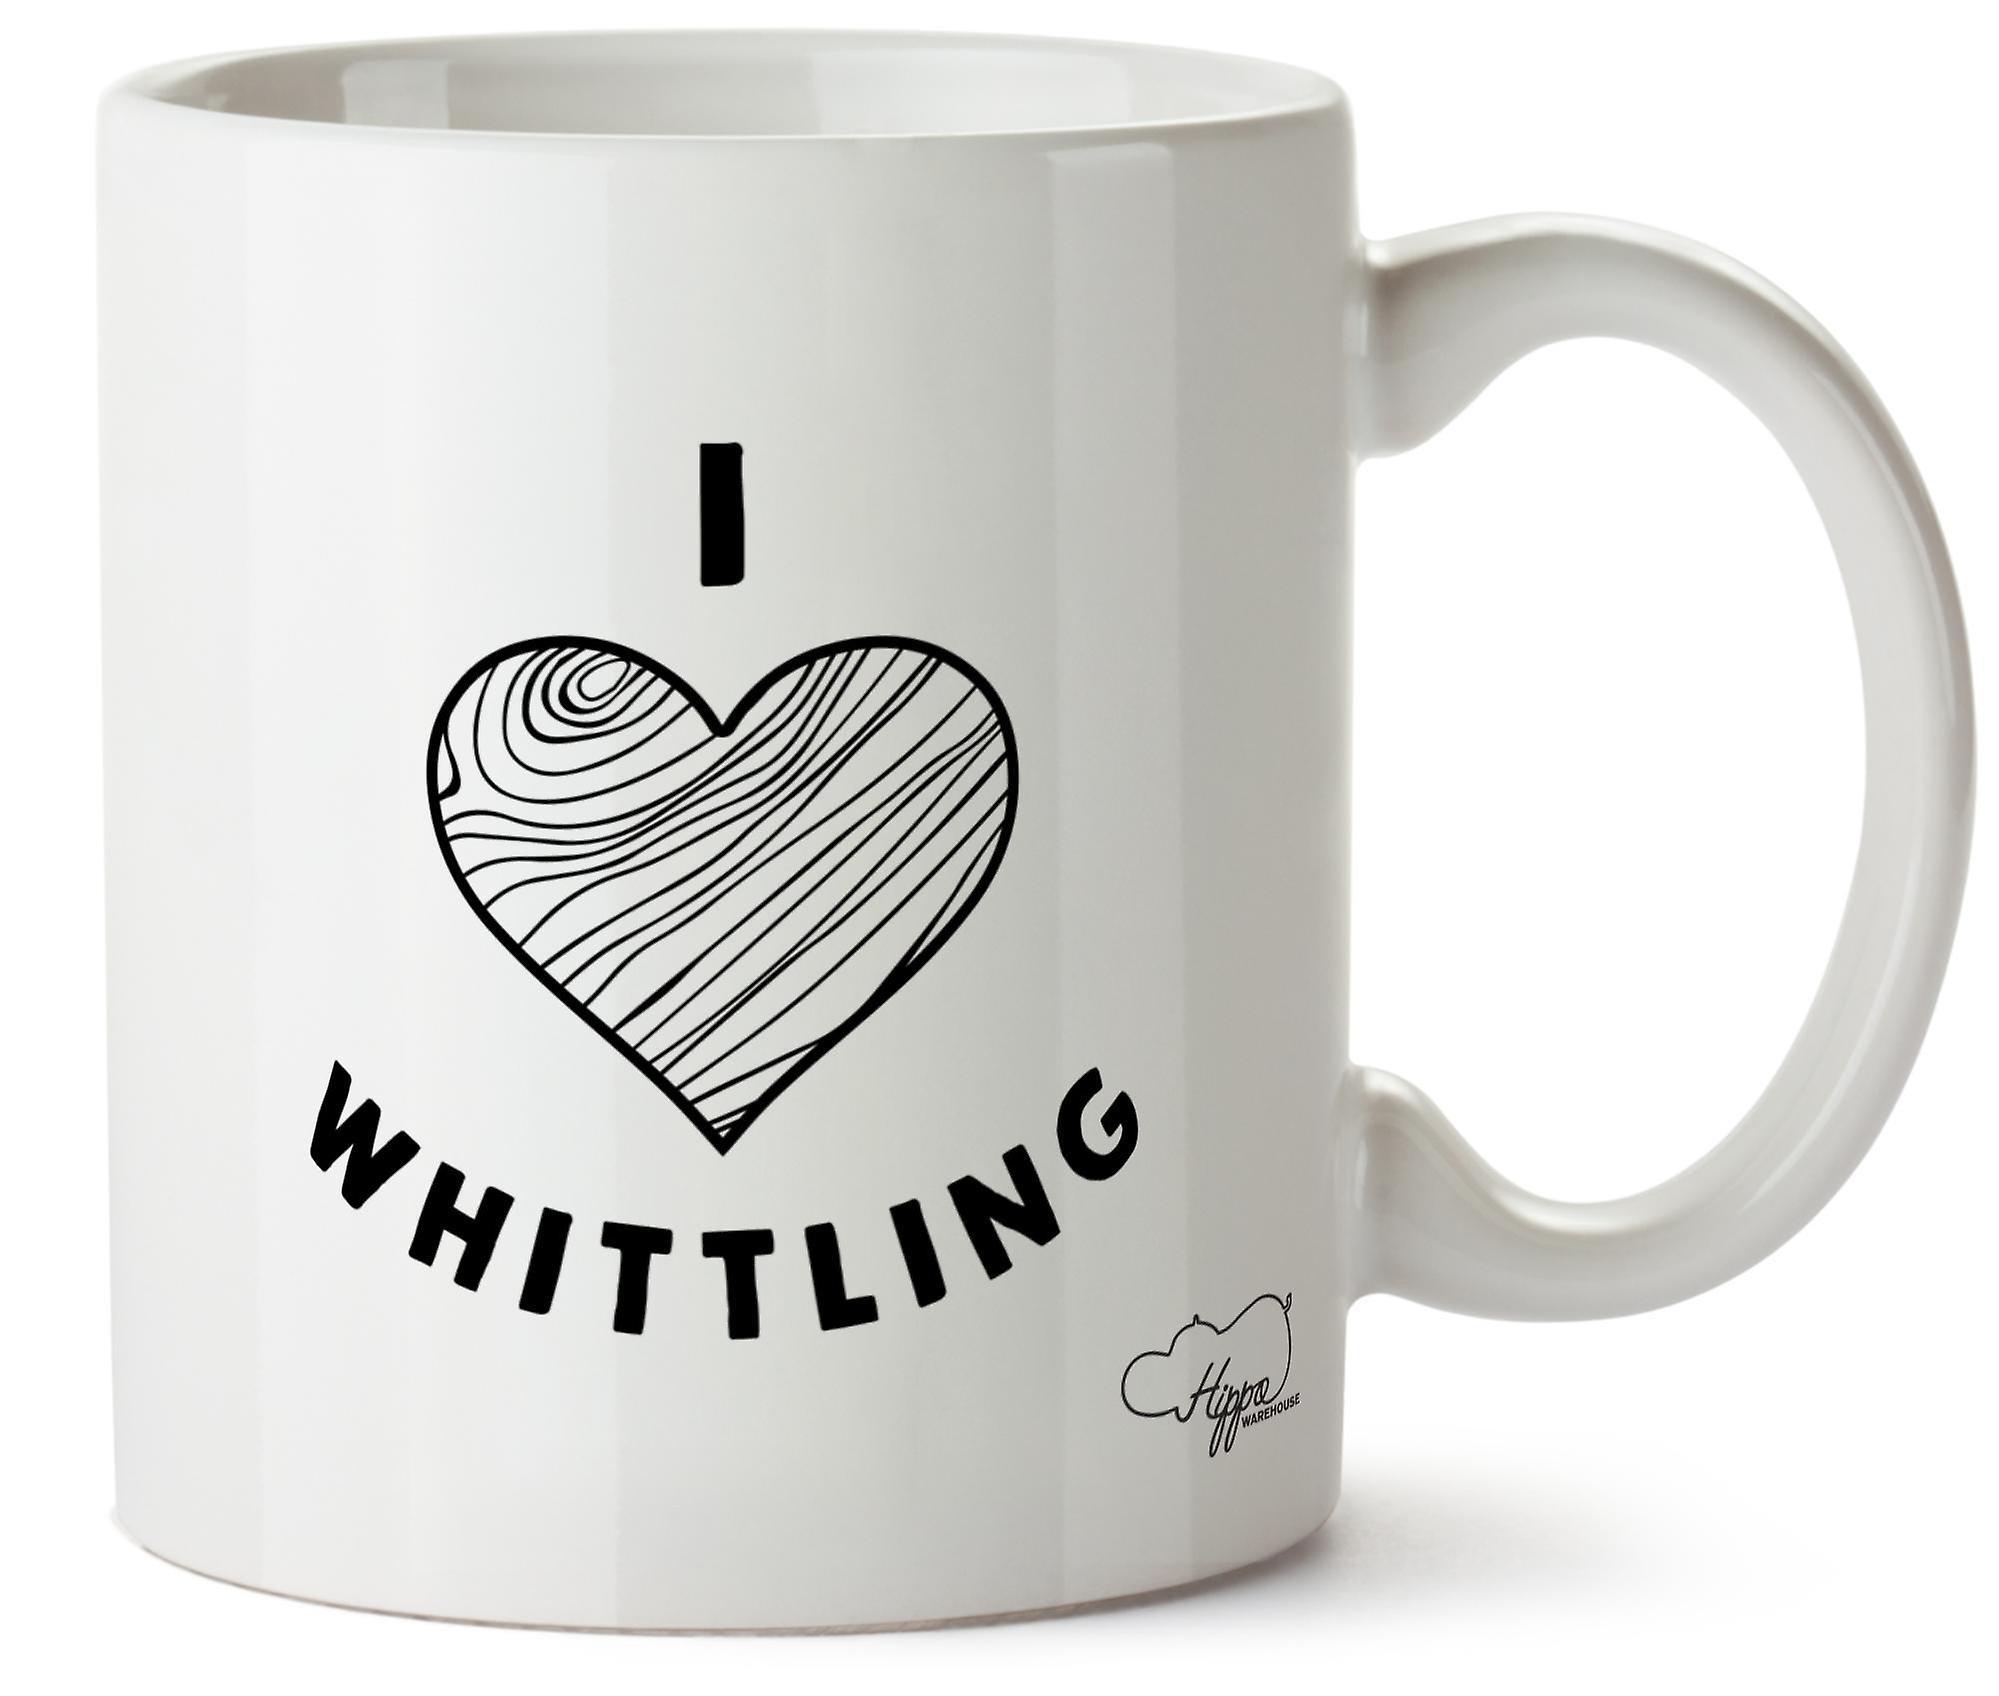 Hippowarehouse I Love Whittling Printed Mug Cup Ceramic 10oz